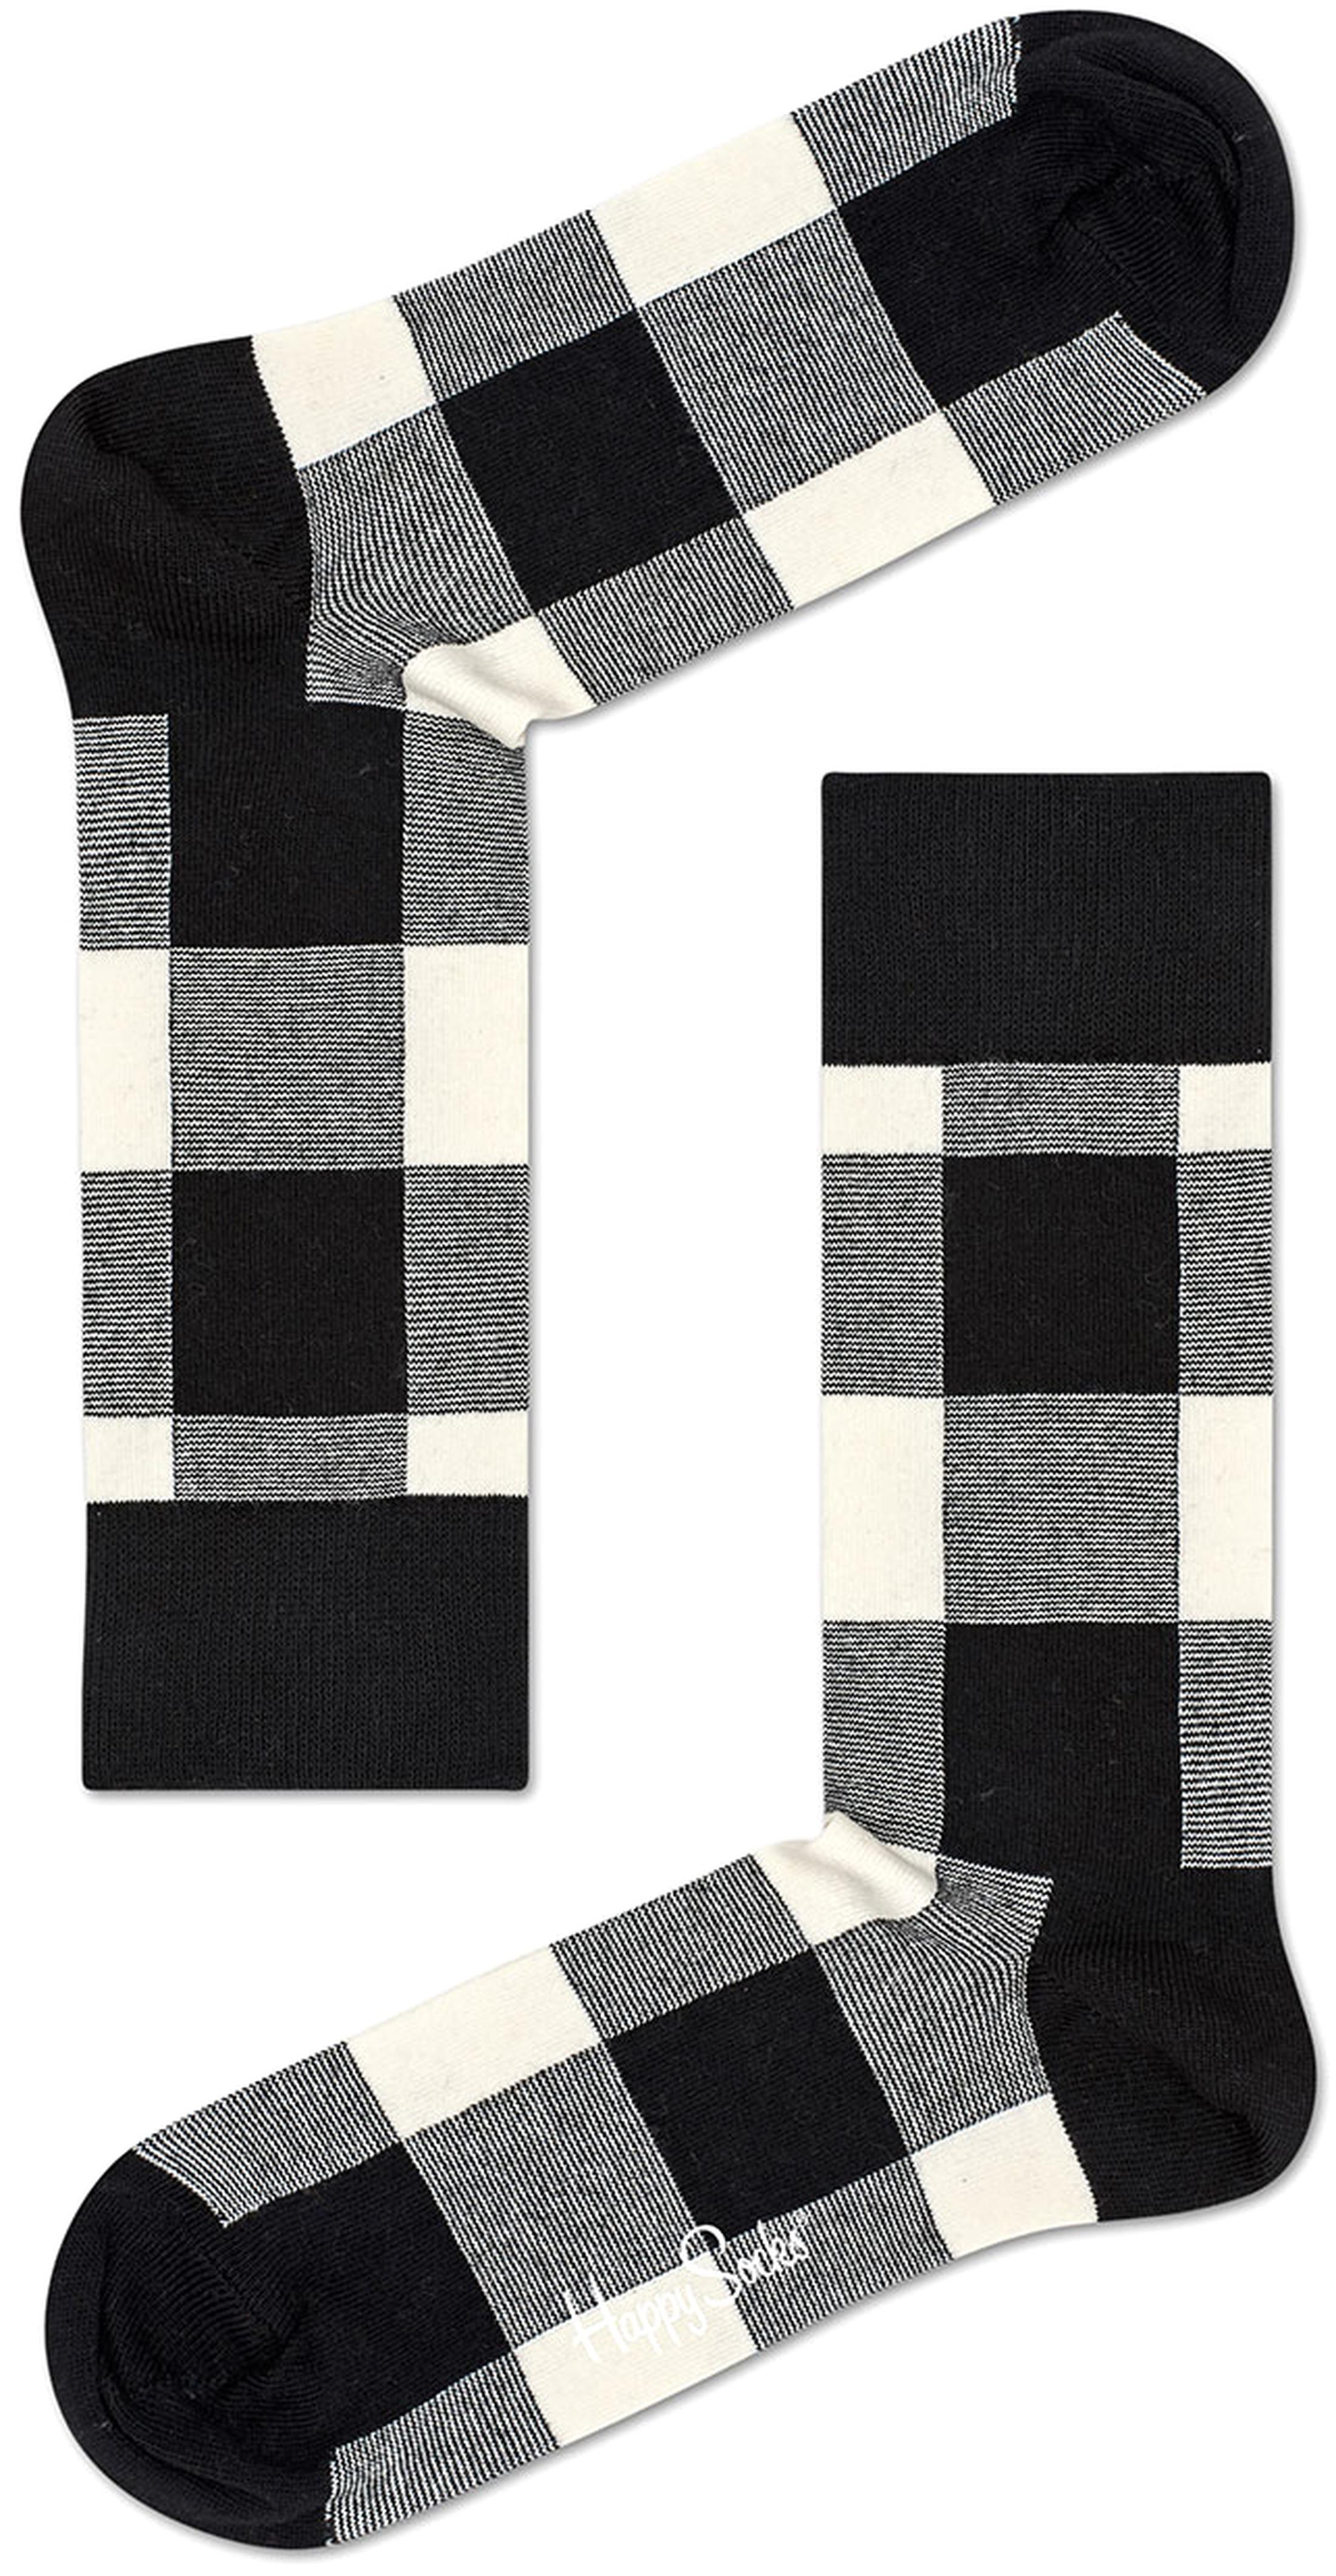 Happy Socks Black & White Gift Box